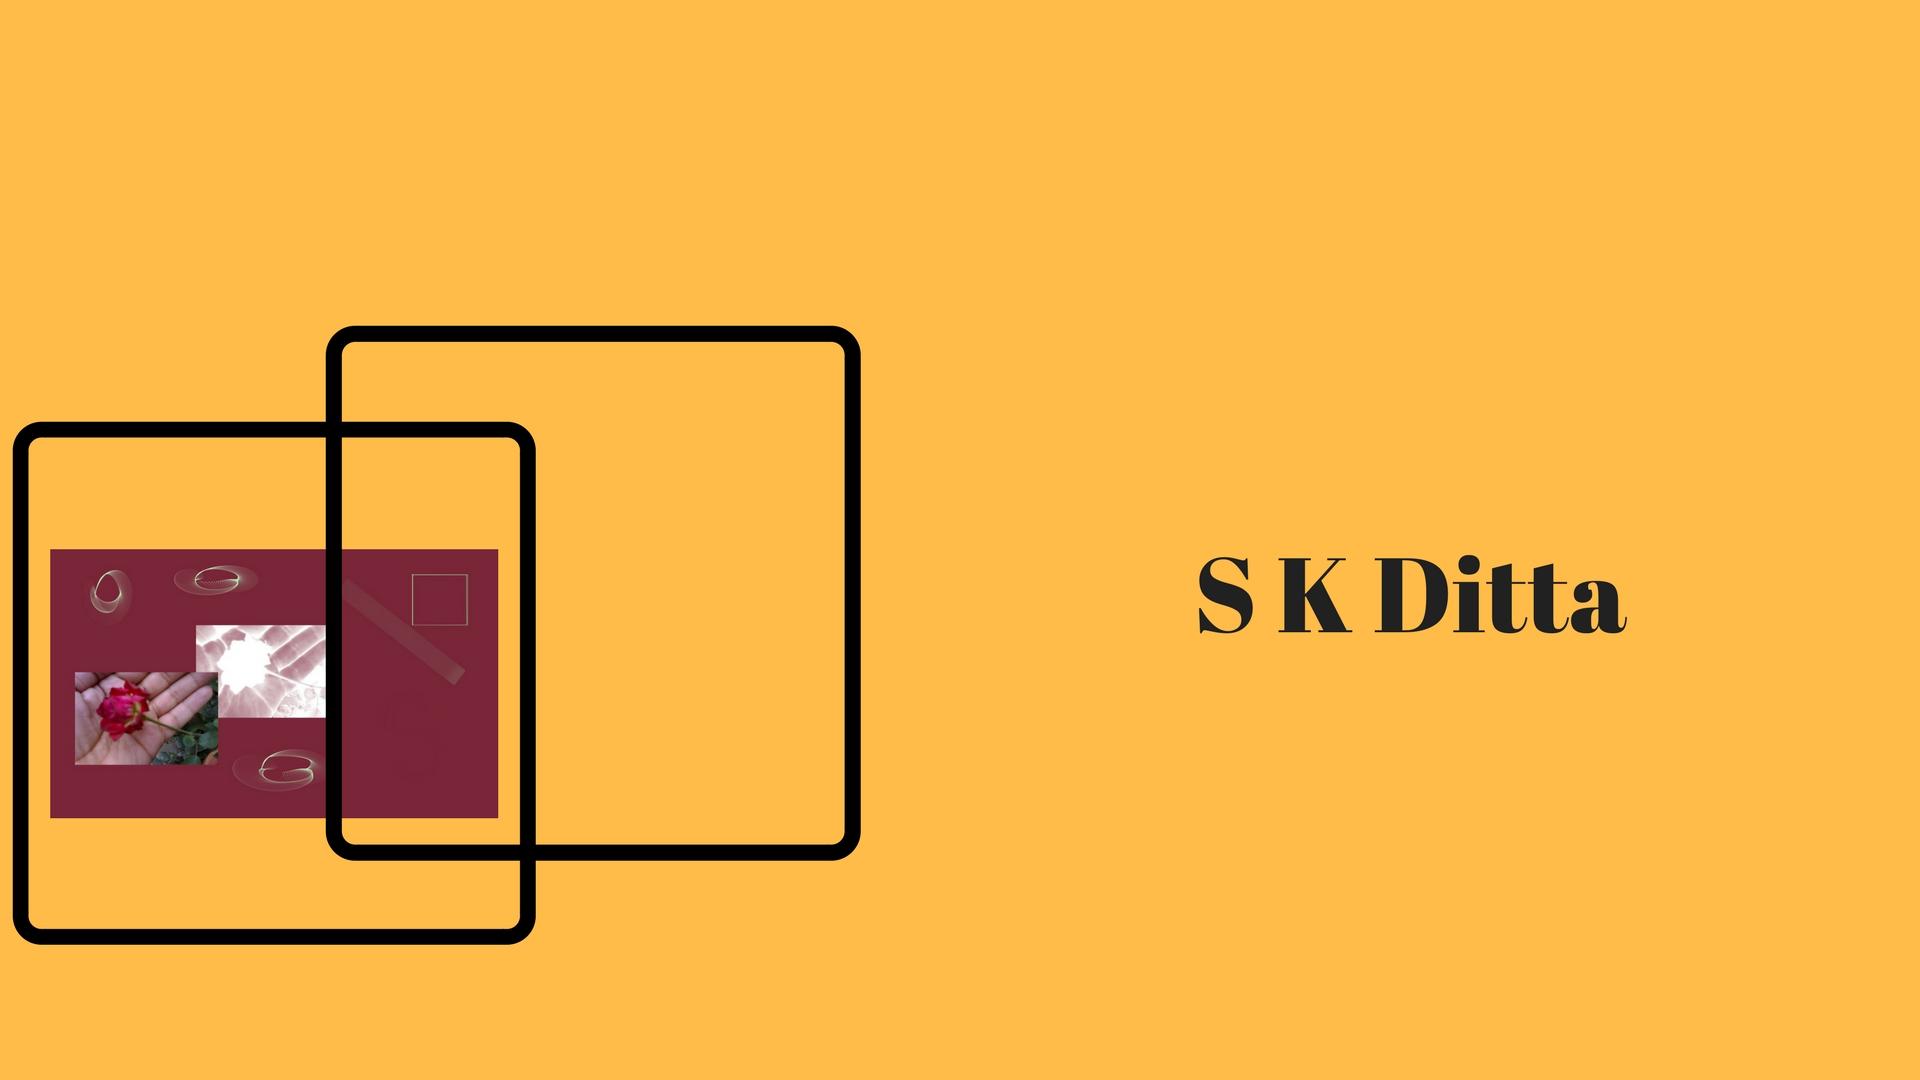 S K Ditta